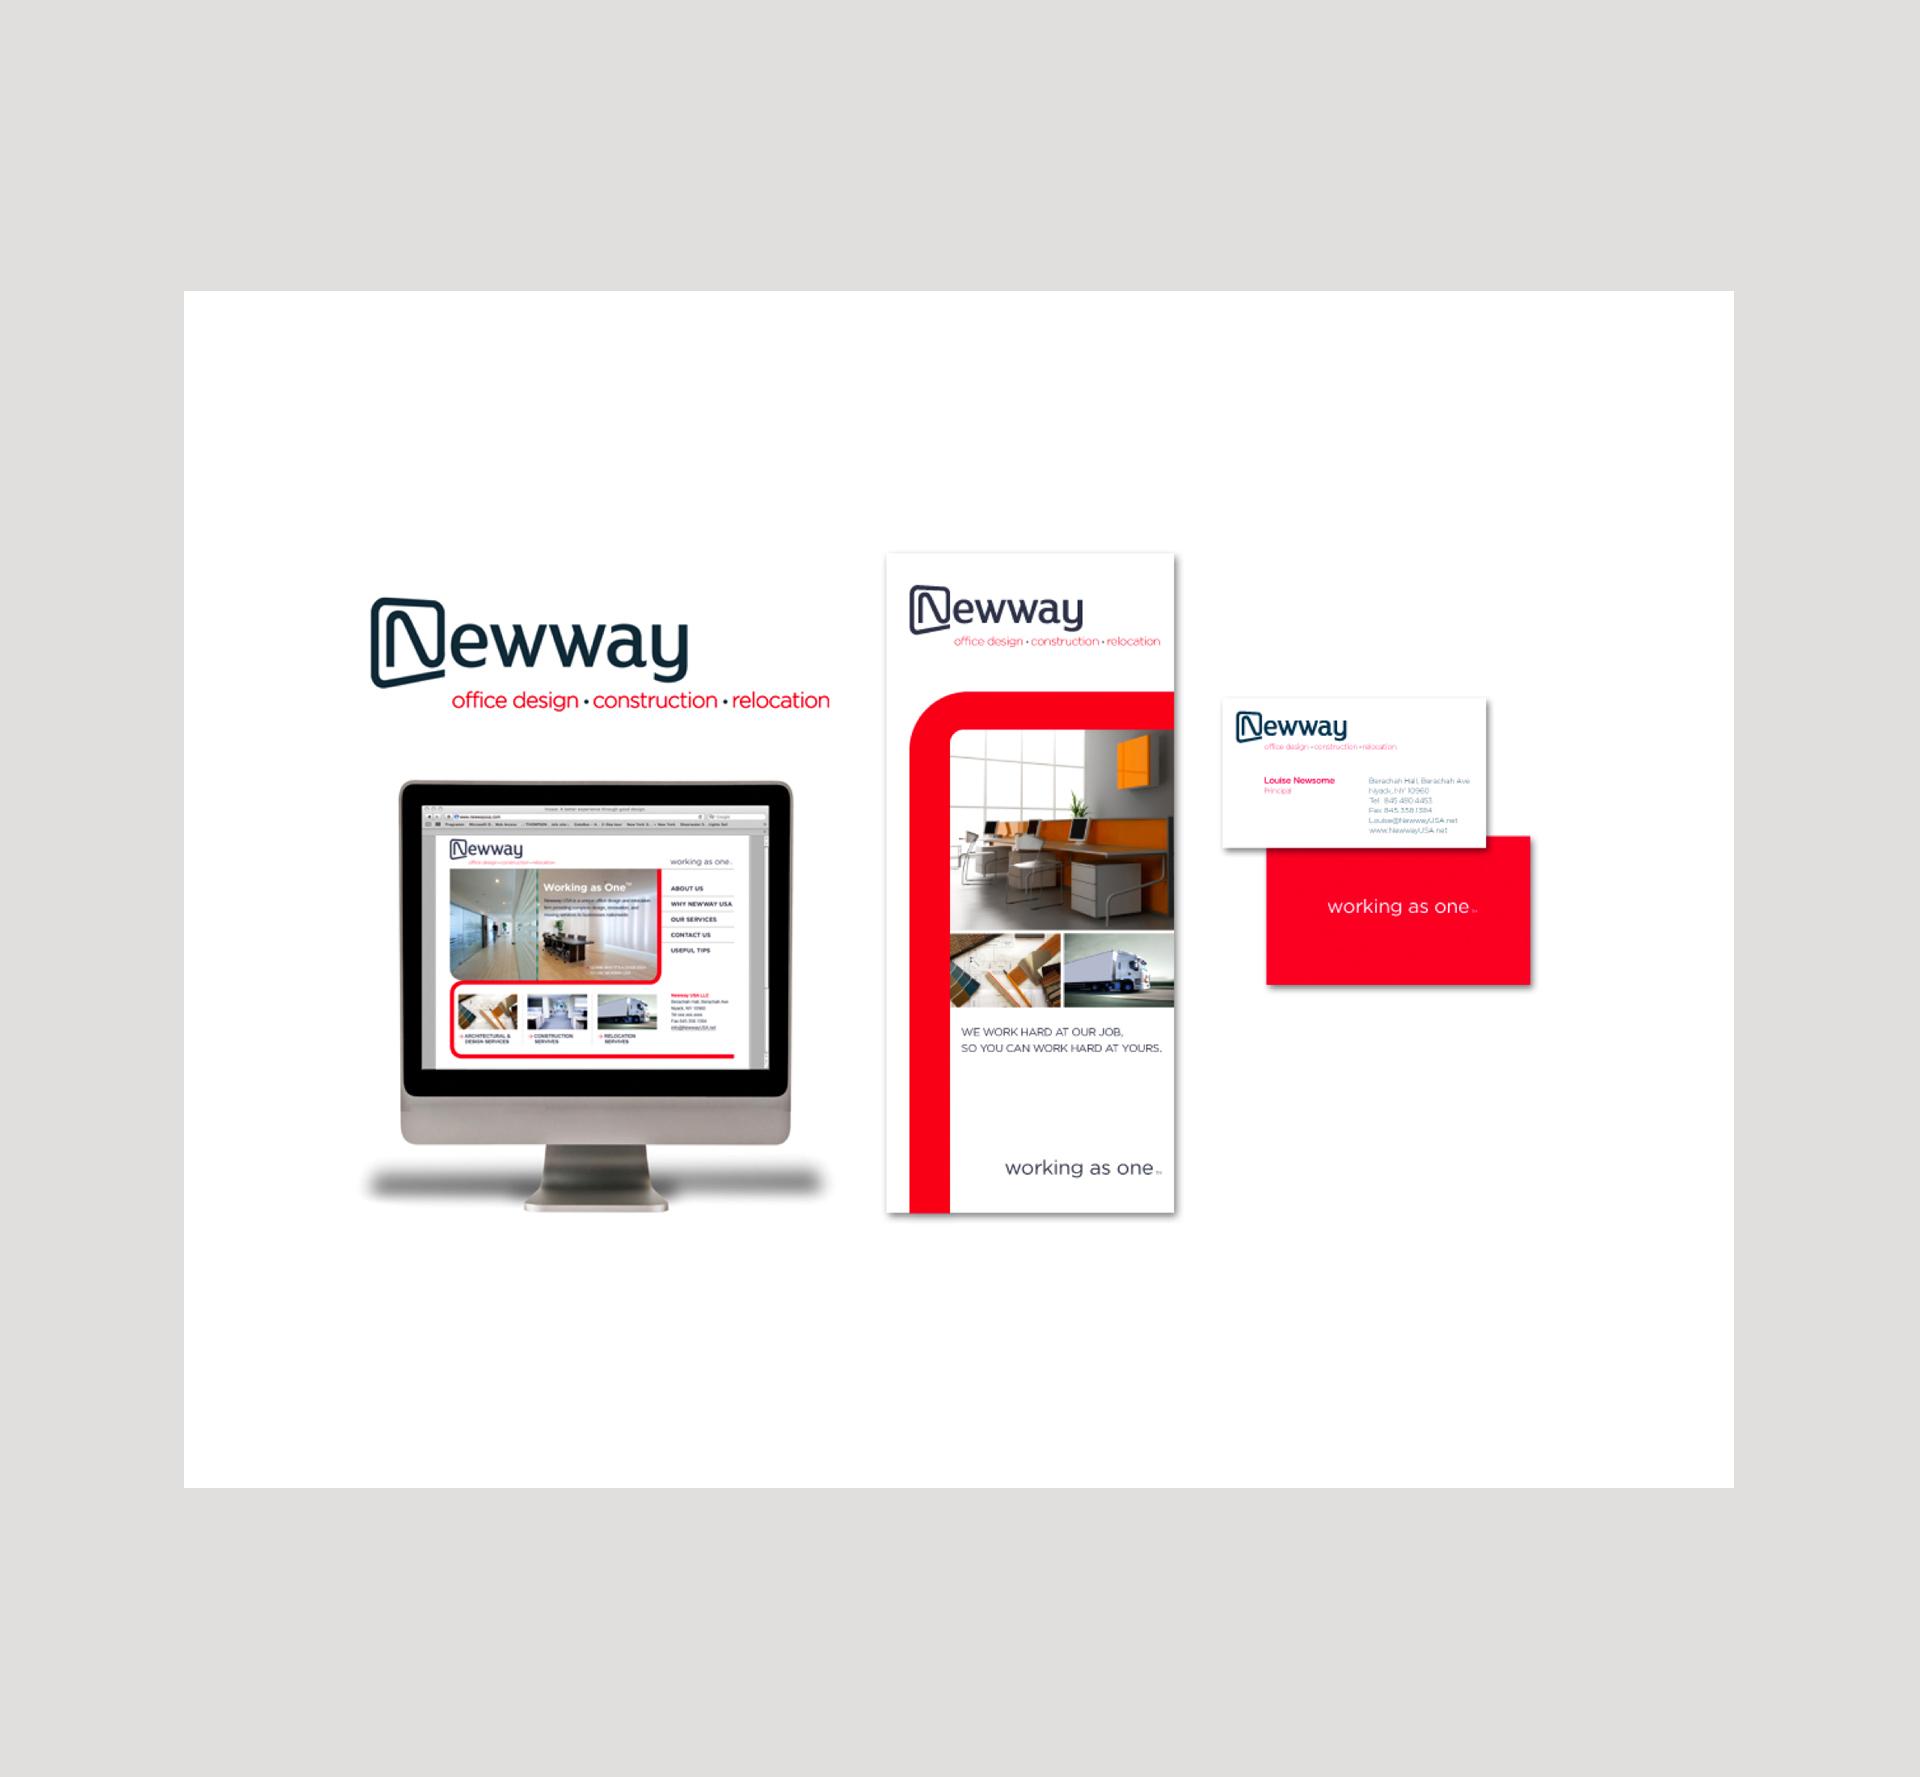 Newway